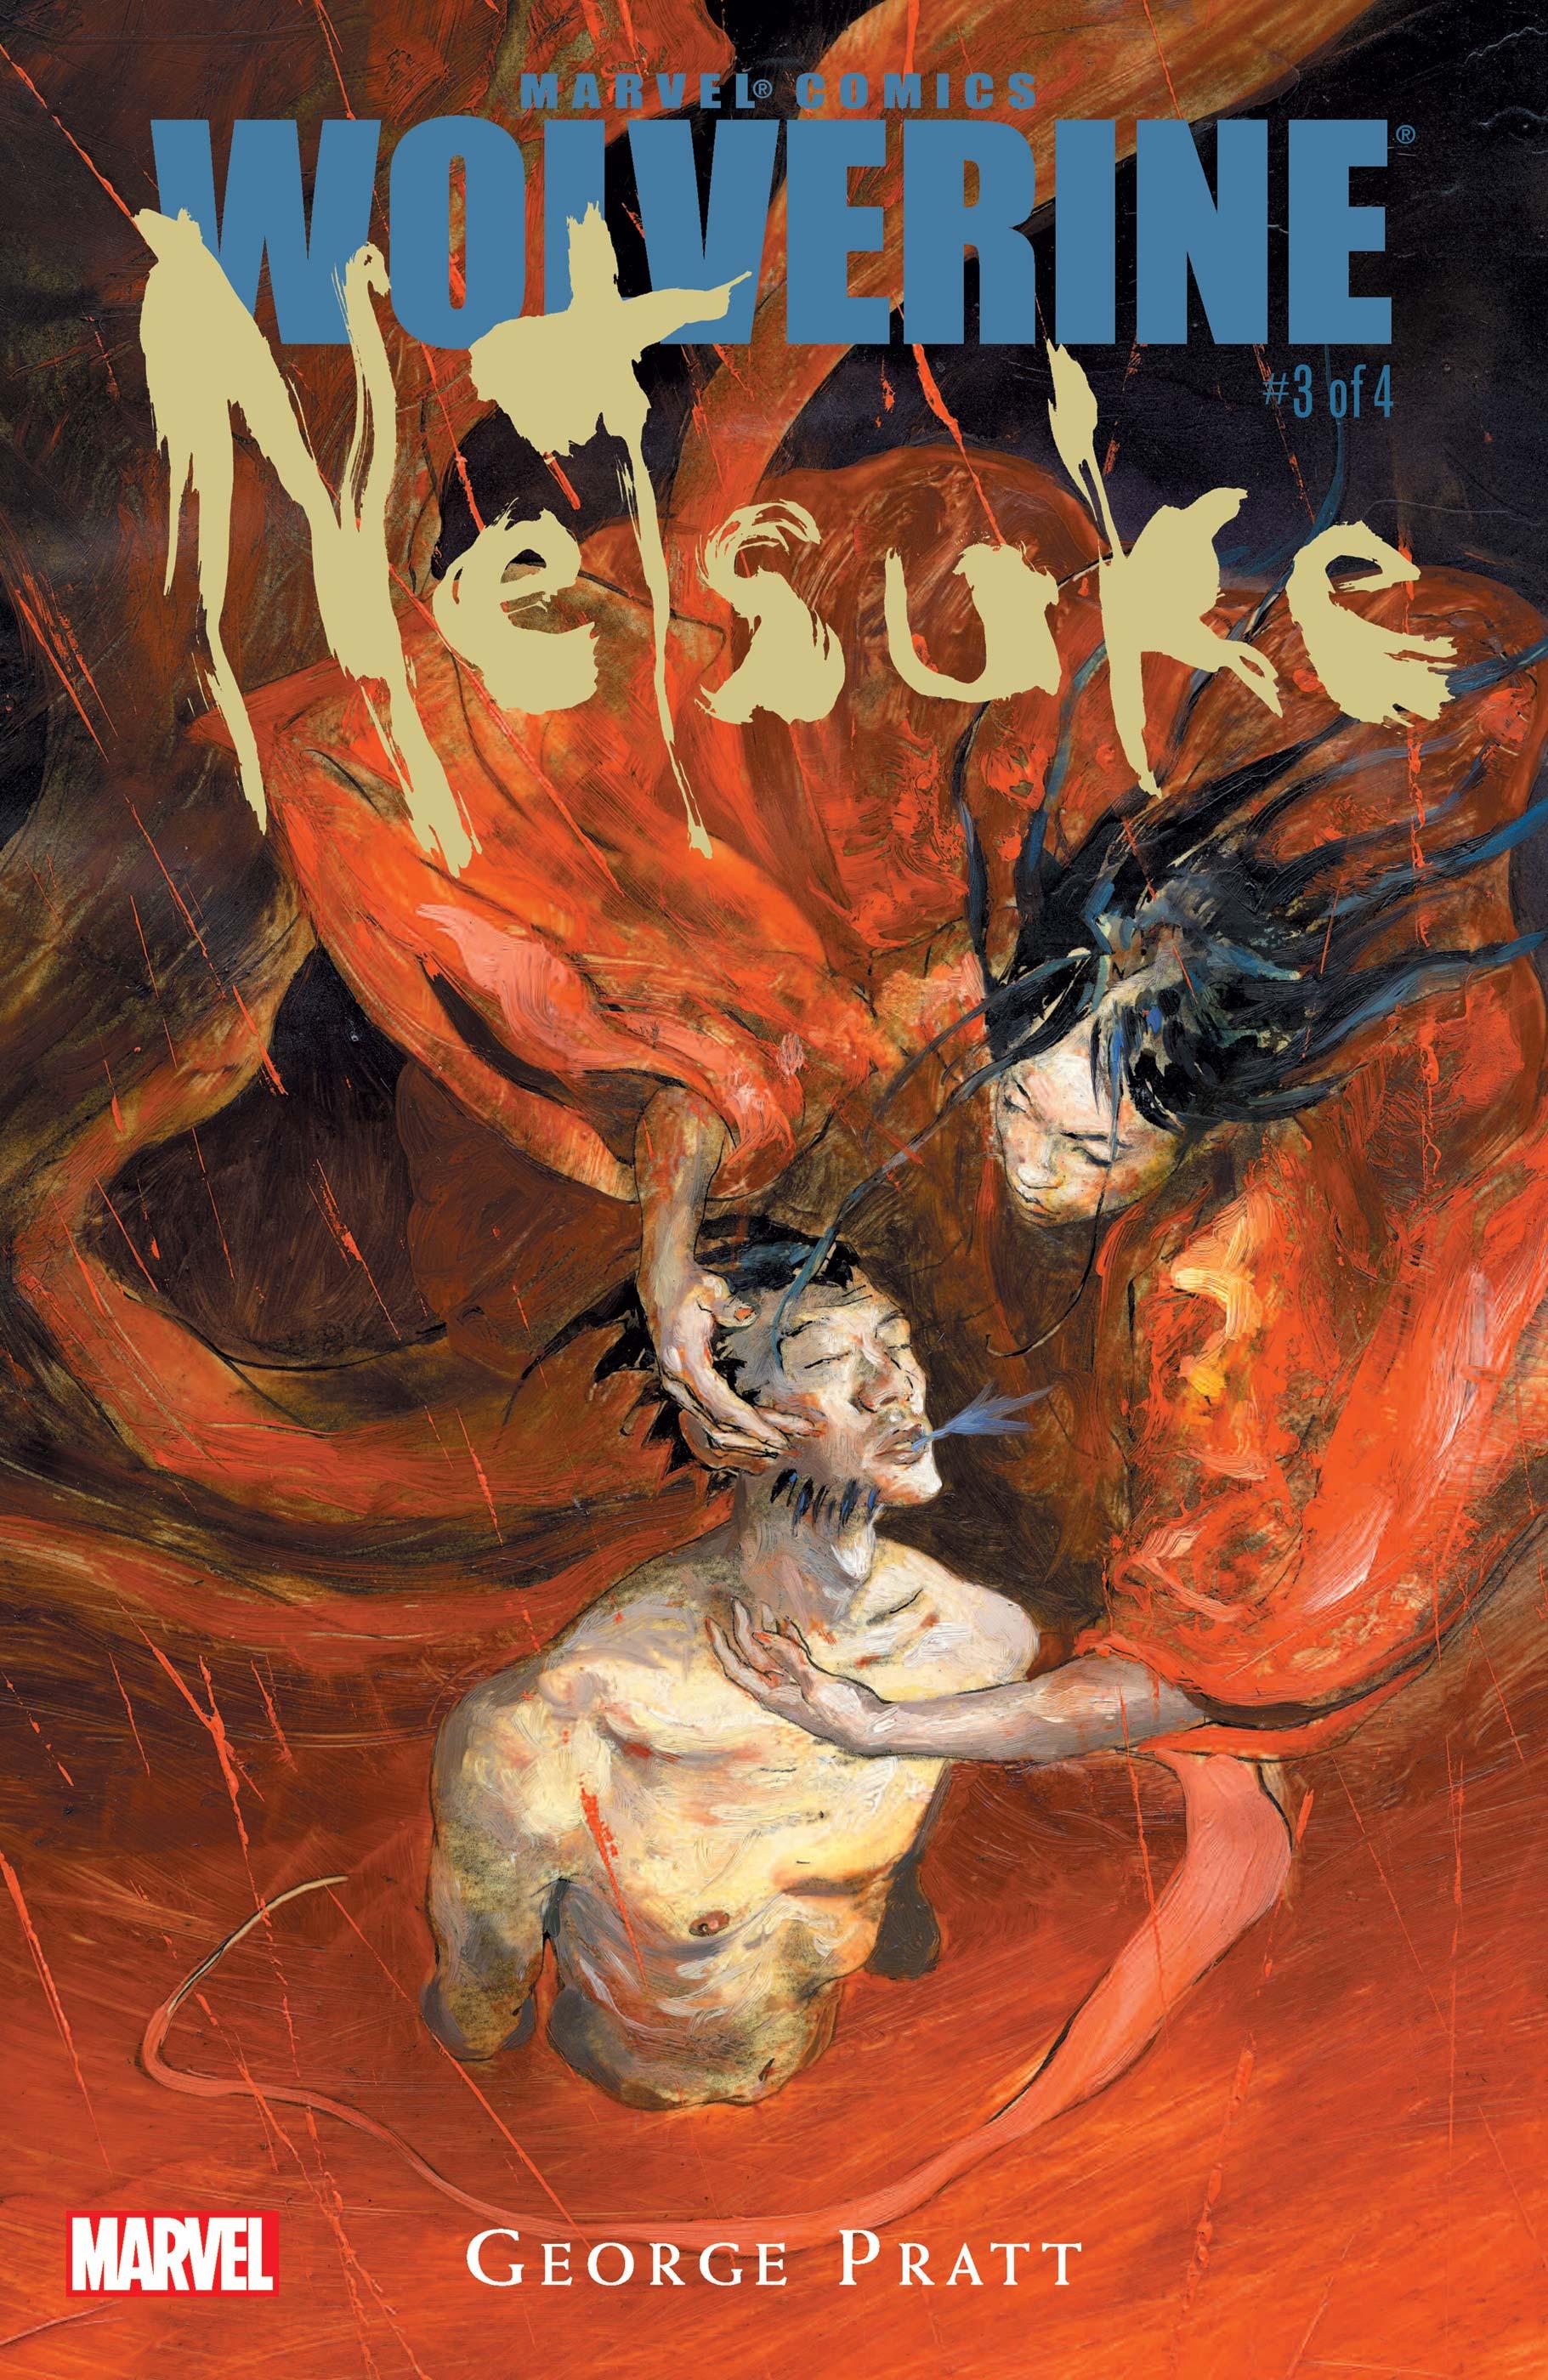 Wolverine: Netsuke (2002) #3